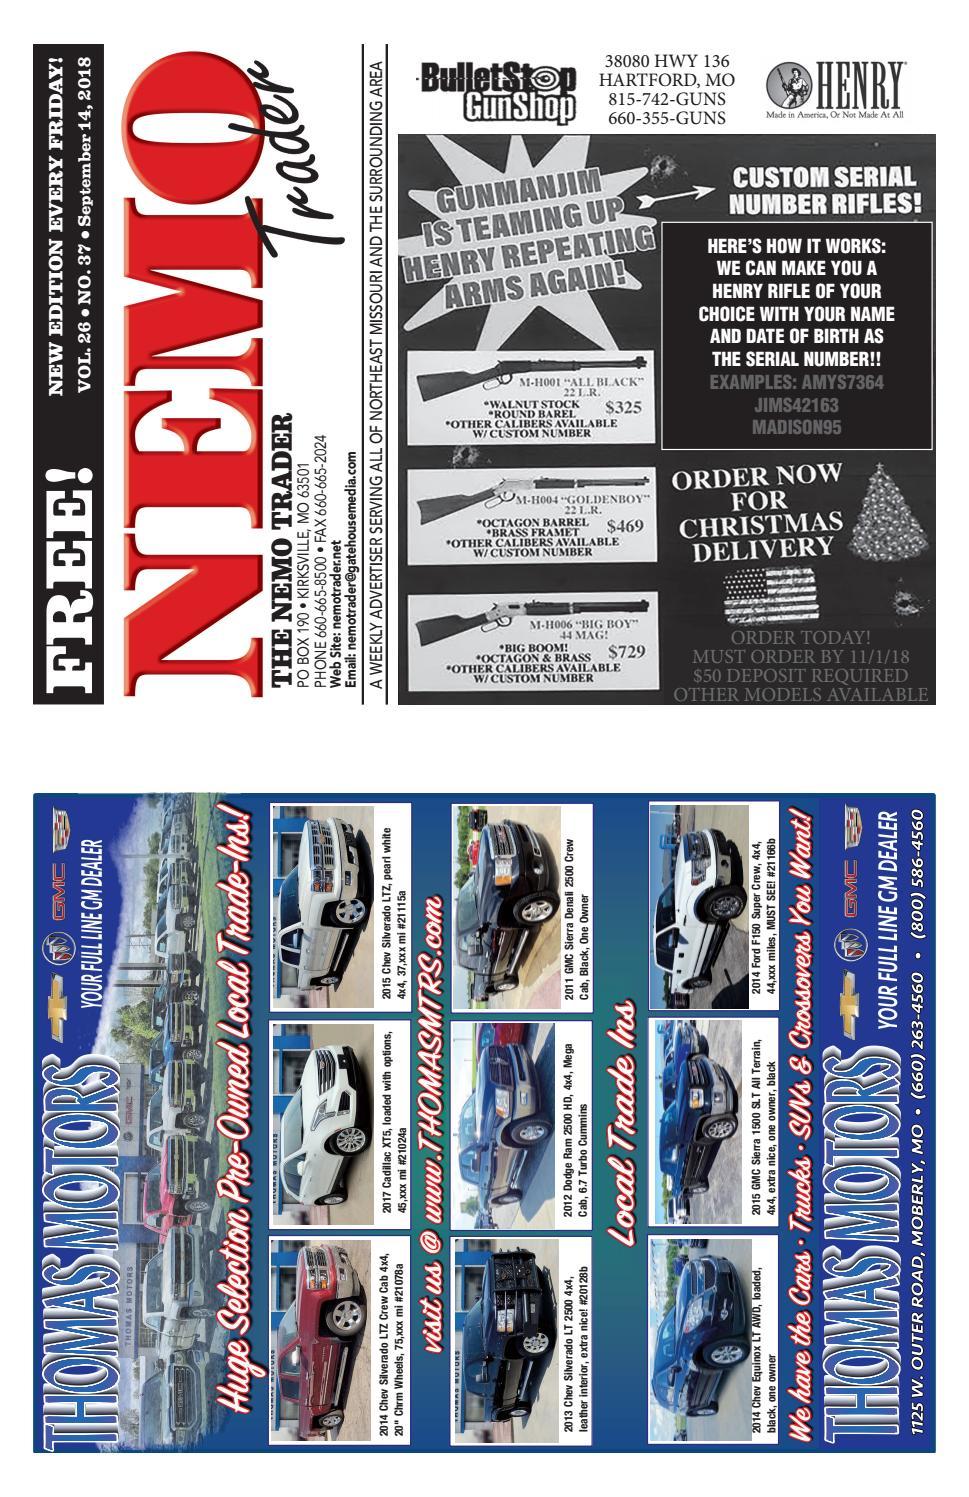 NEMO Trader September 14th, 2018 by NEMO Trader - issuu